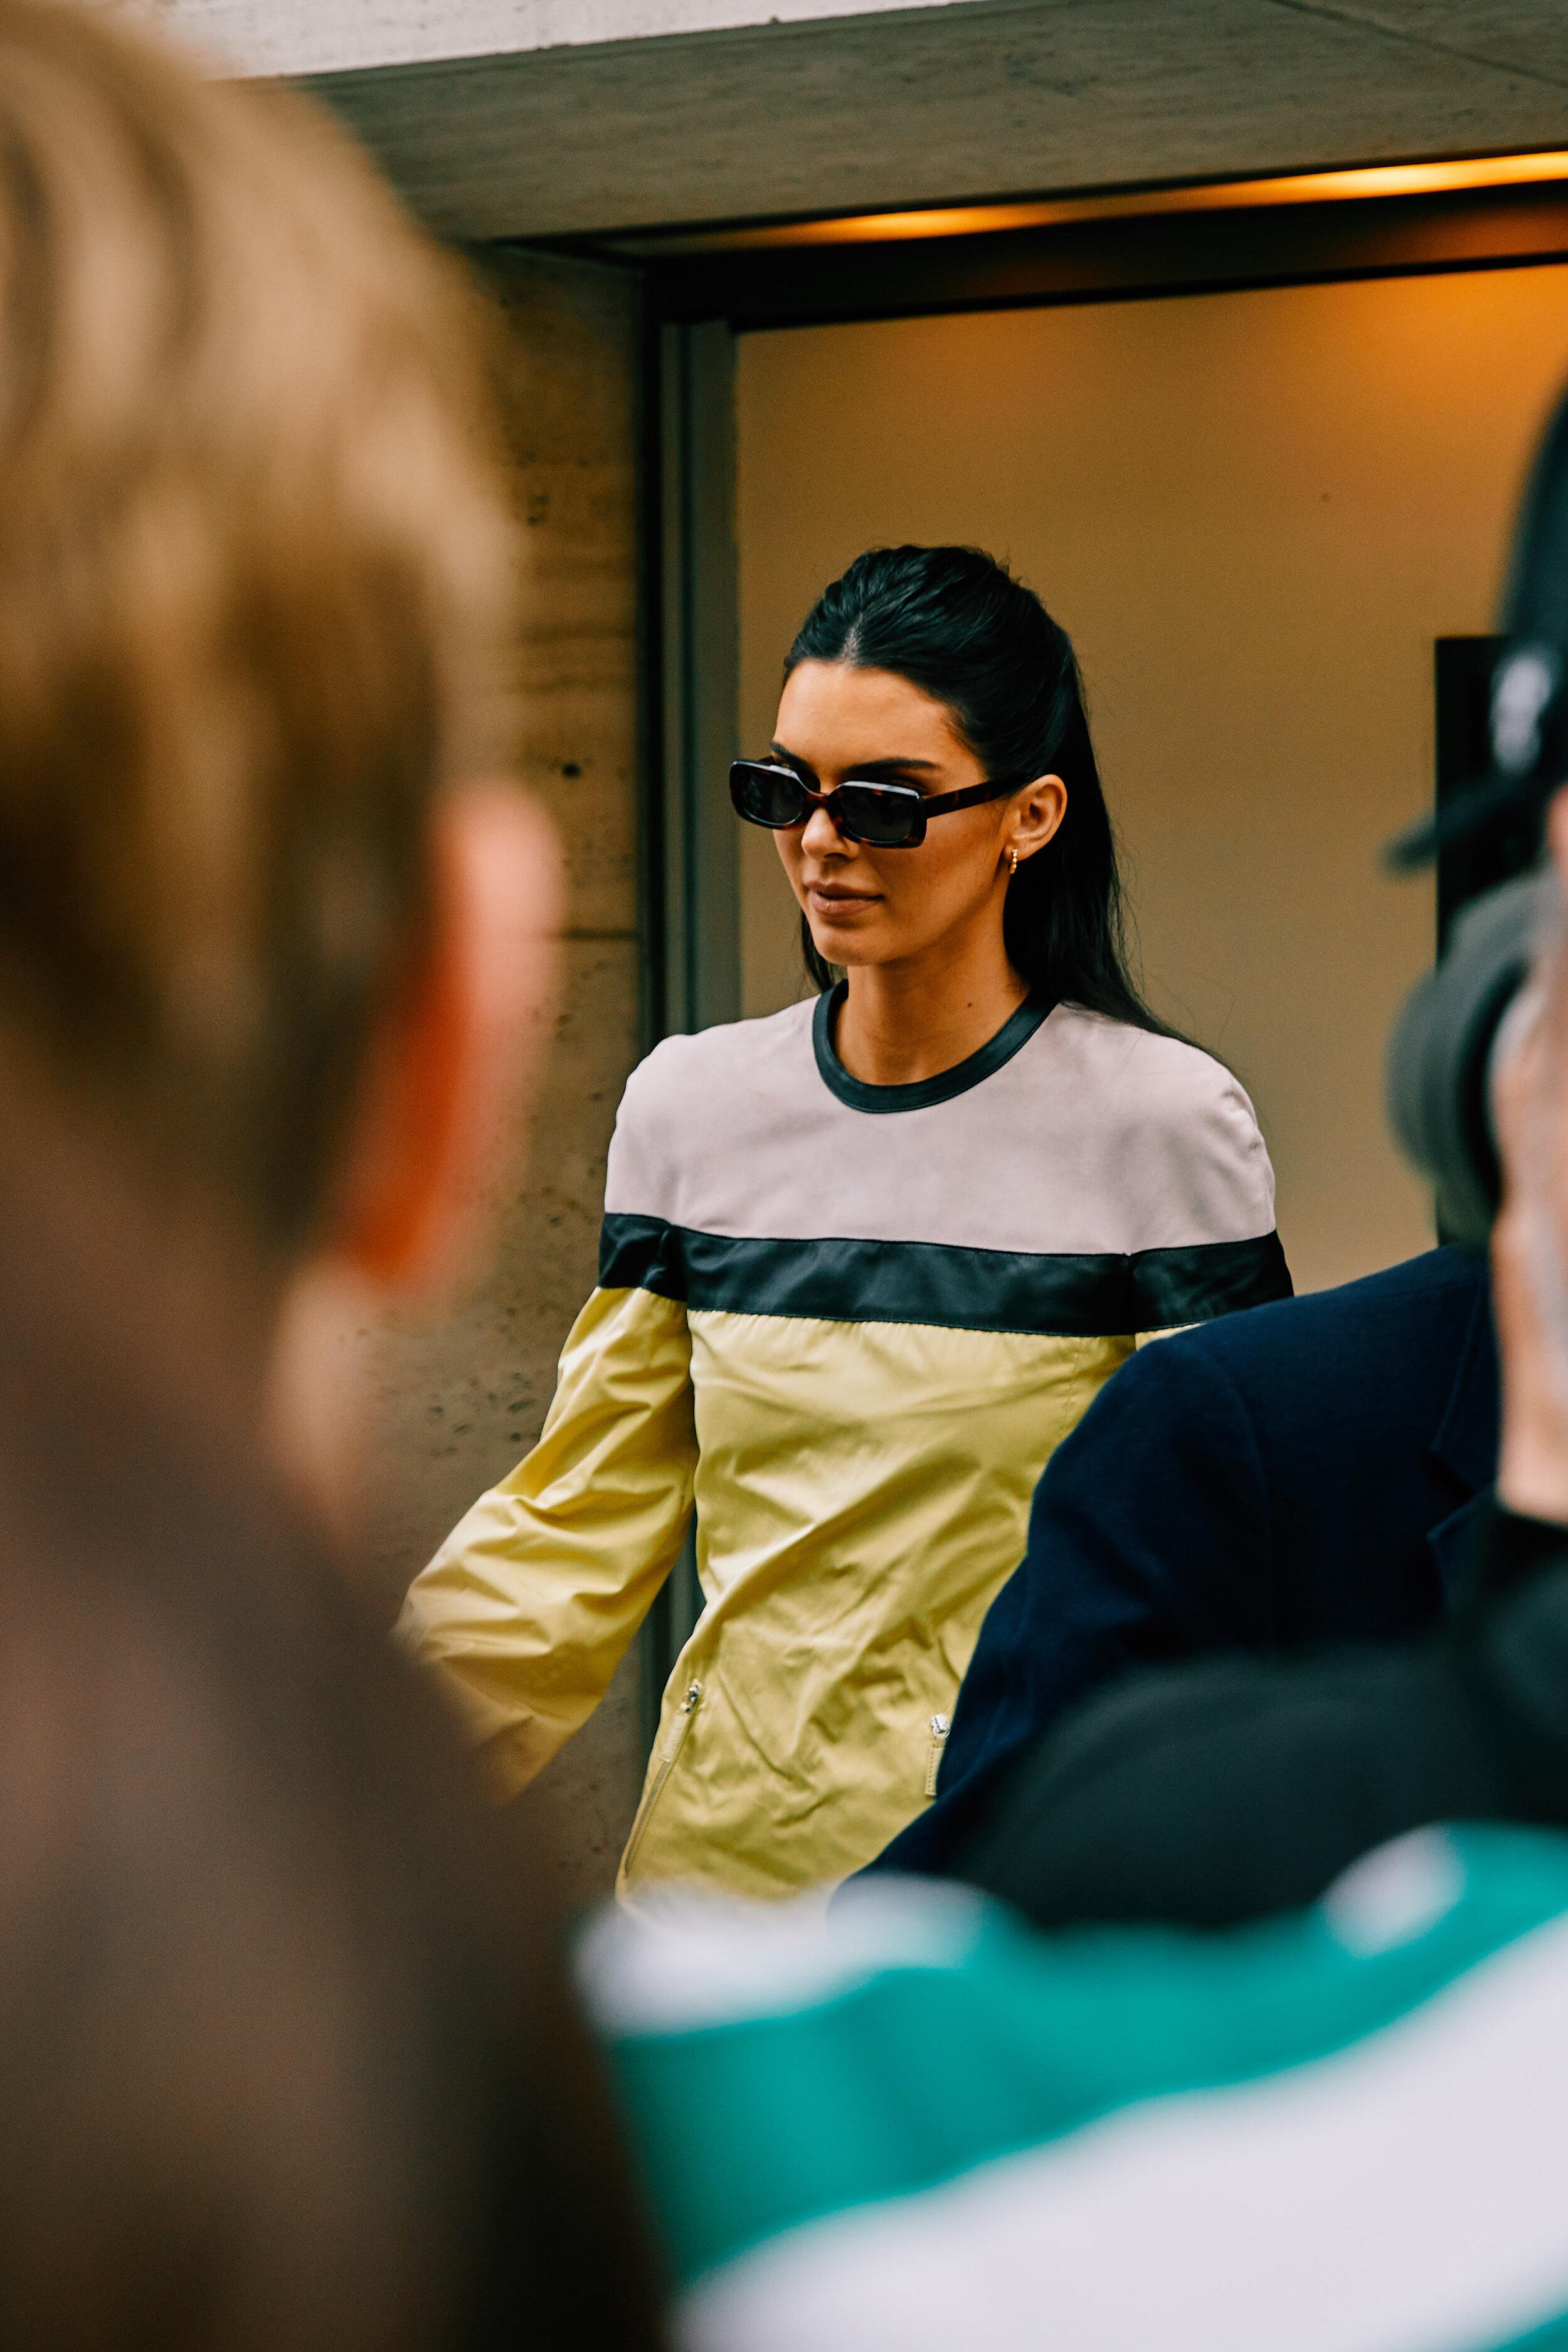 • Kendall Jenner @ Longchamp • NYFW SEPT 2019 • Photographed x Denis Gutiérrez-Ogrinc •